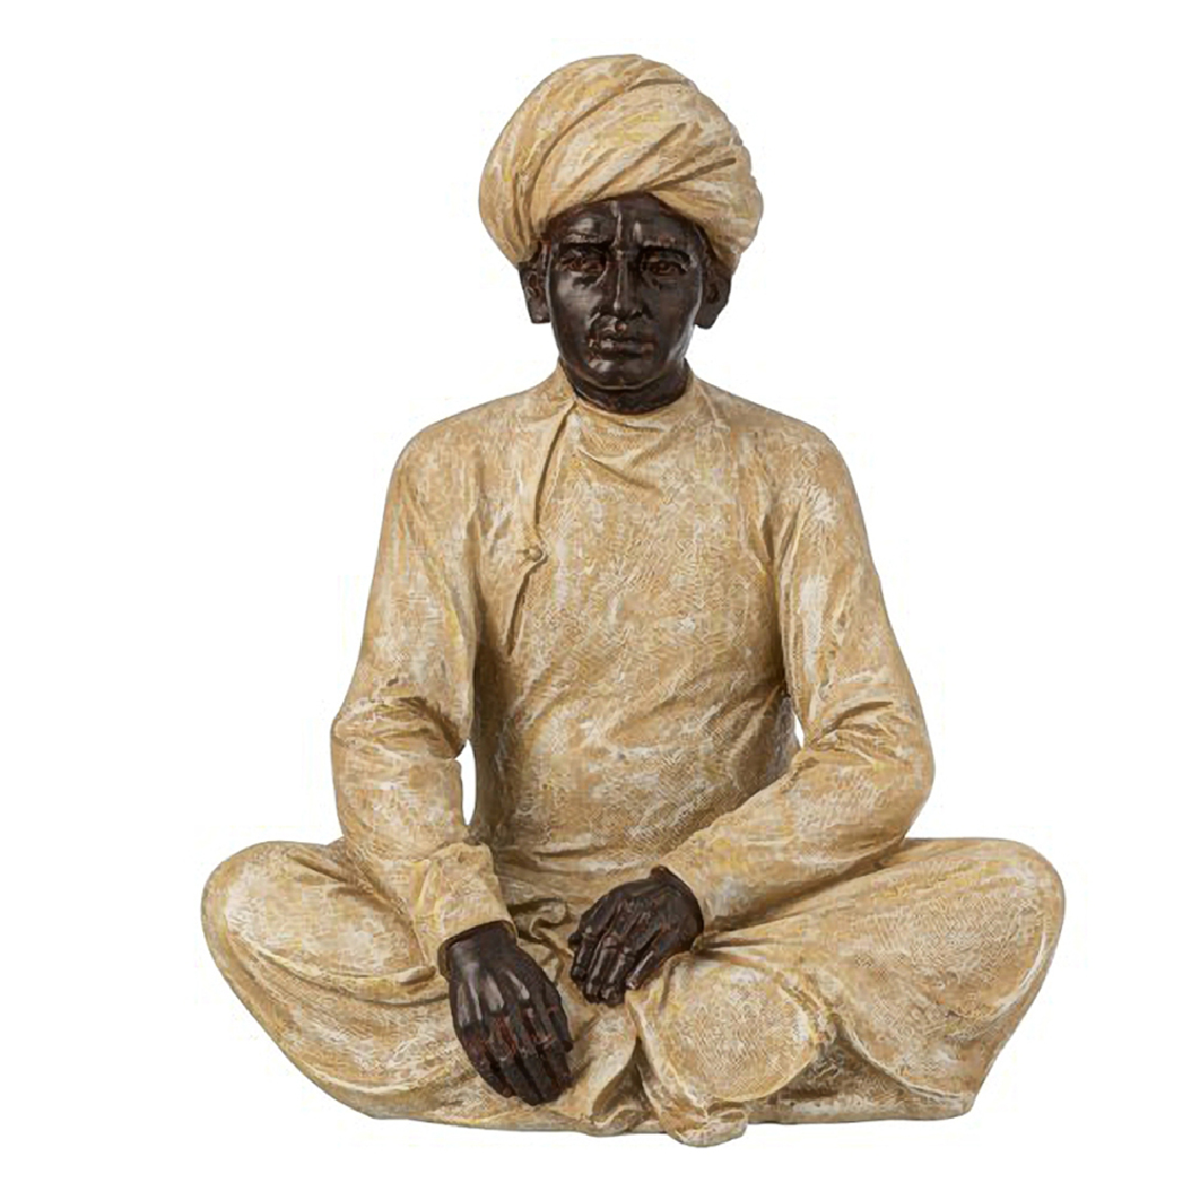 Ixo Statuette Homme Indien Assis